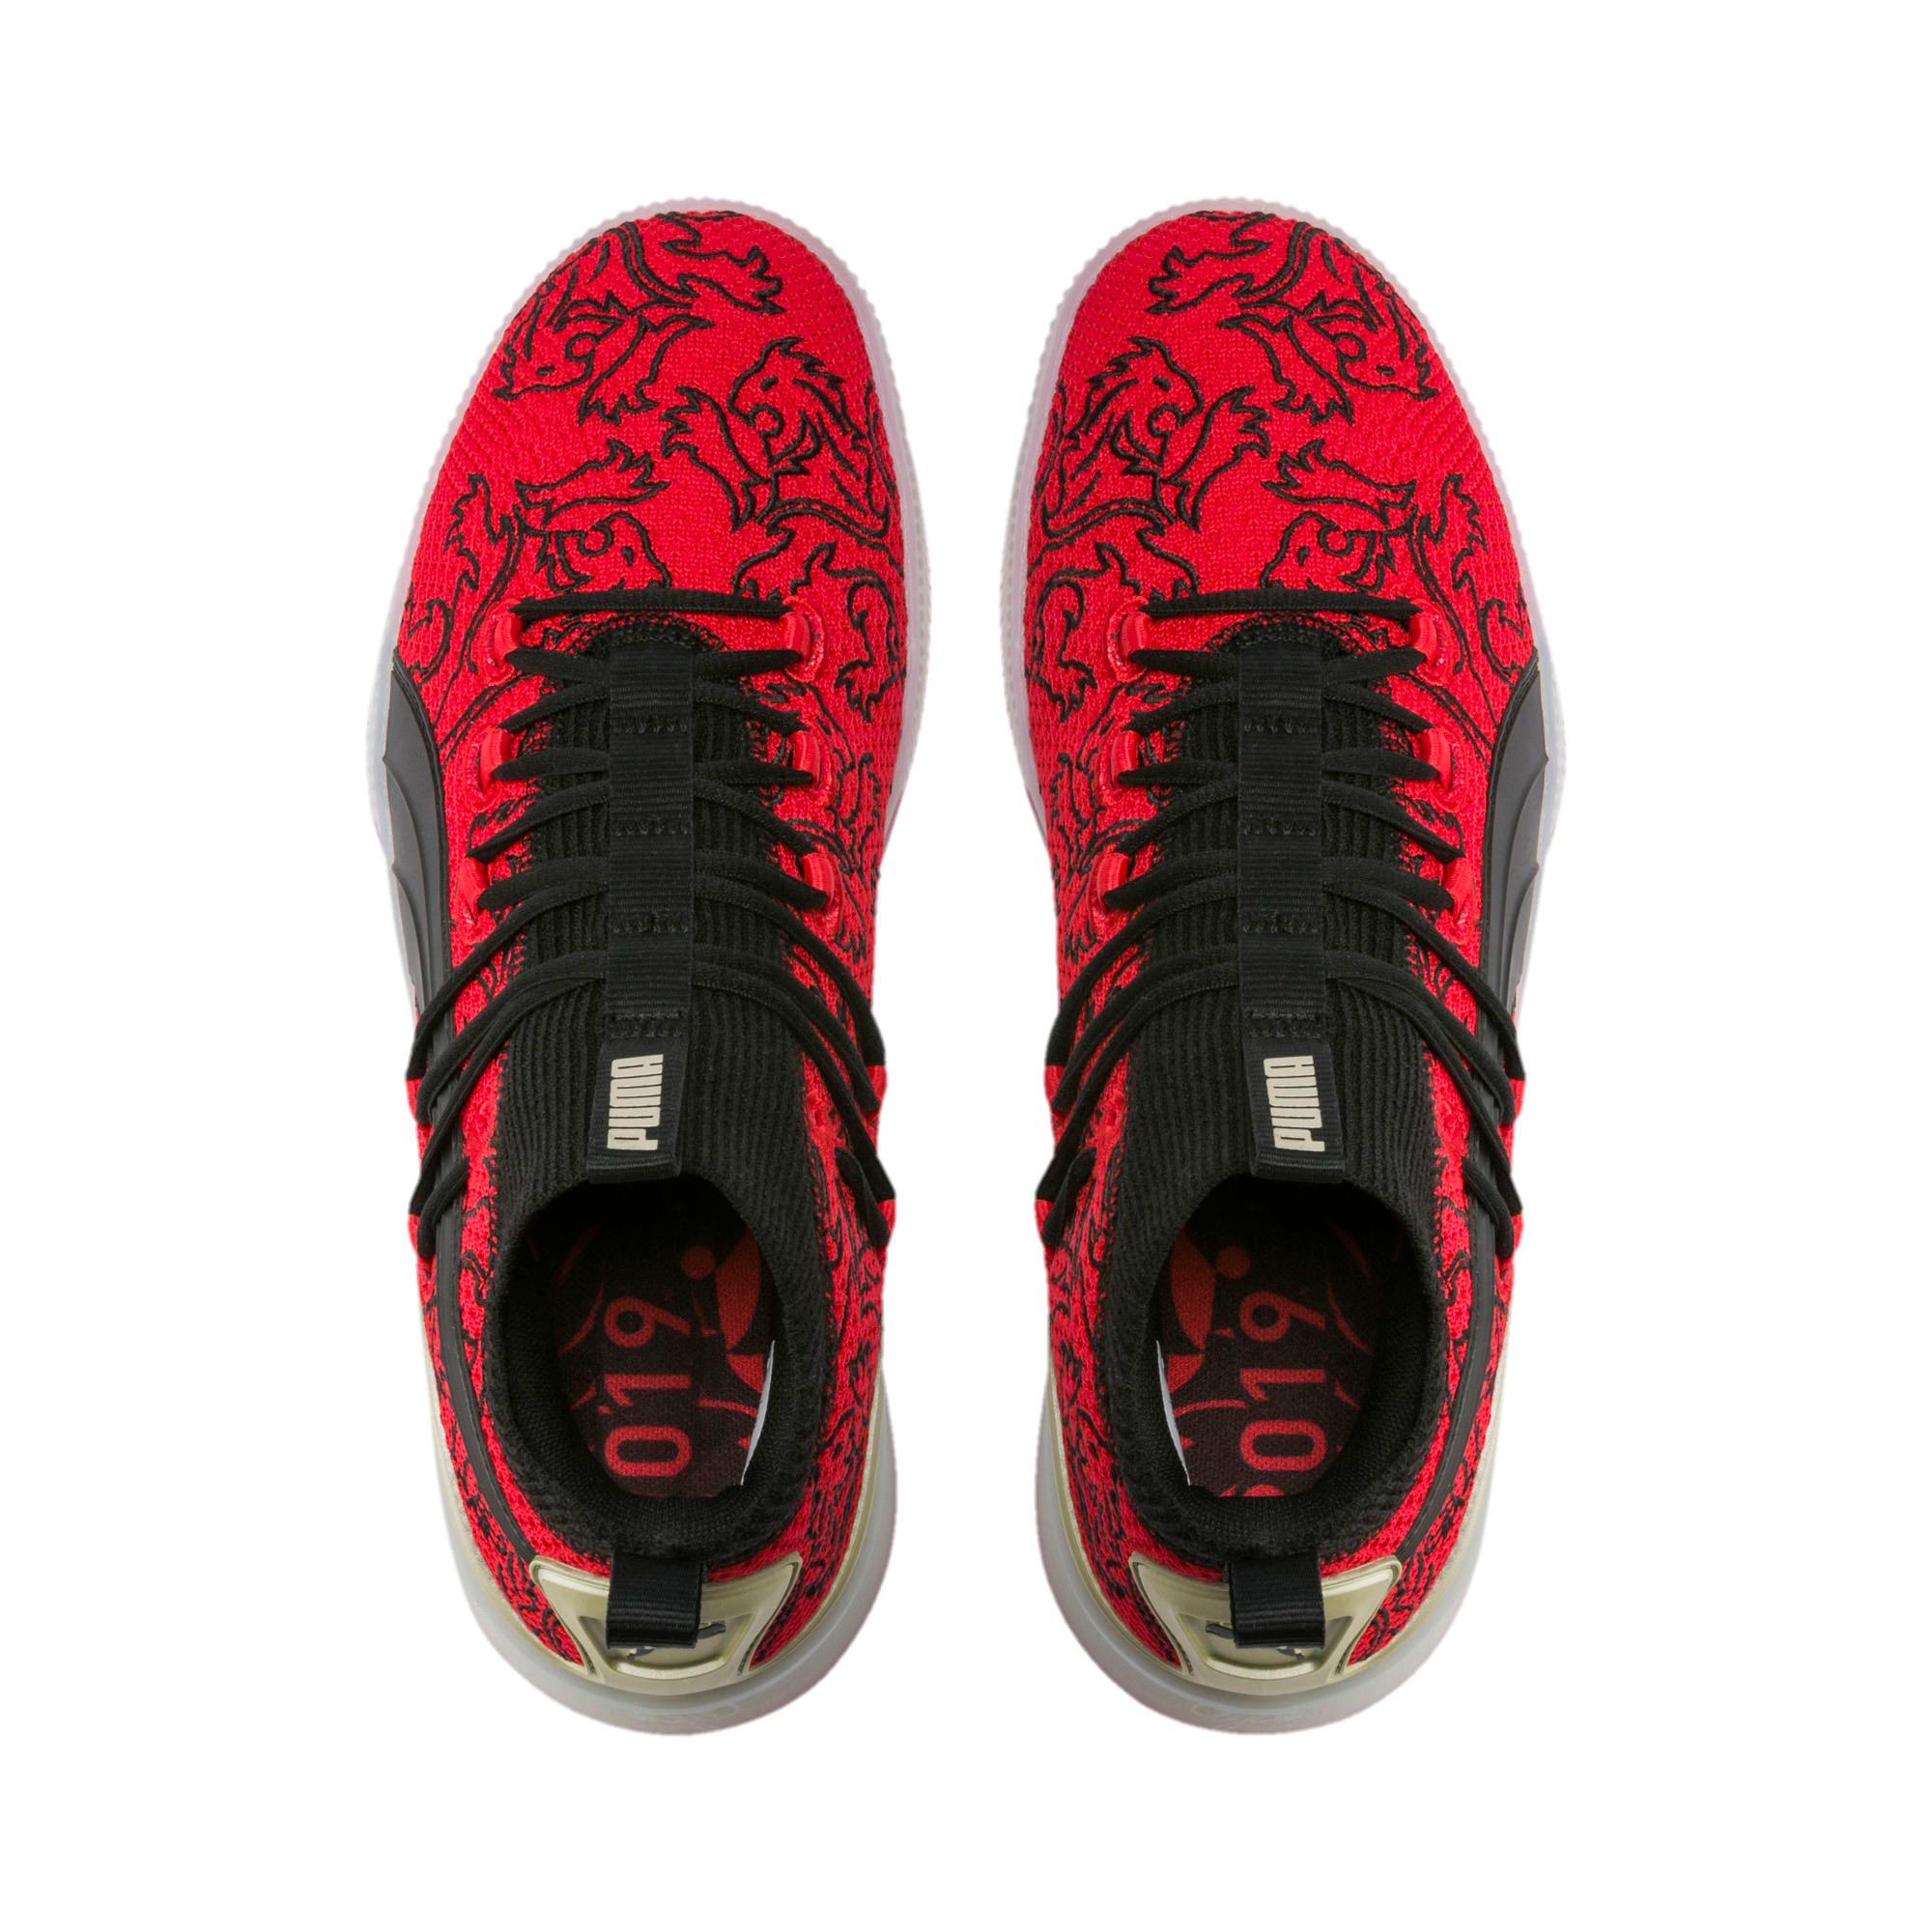 Imagen en miniatura 6 de Zapatillas de baloncesto de hombre Clyde Court London, High Risk Red-Puma Black, mediana